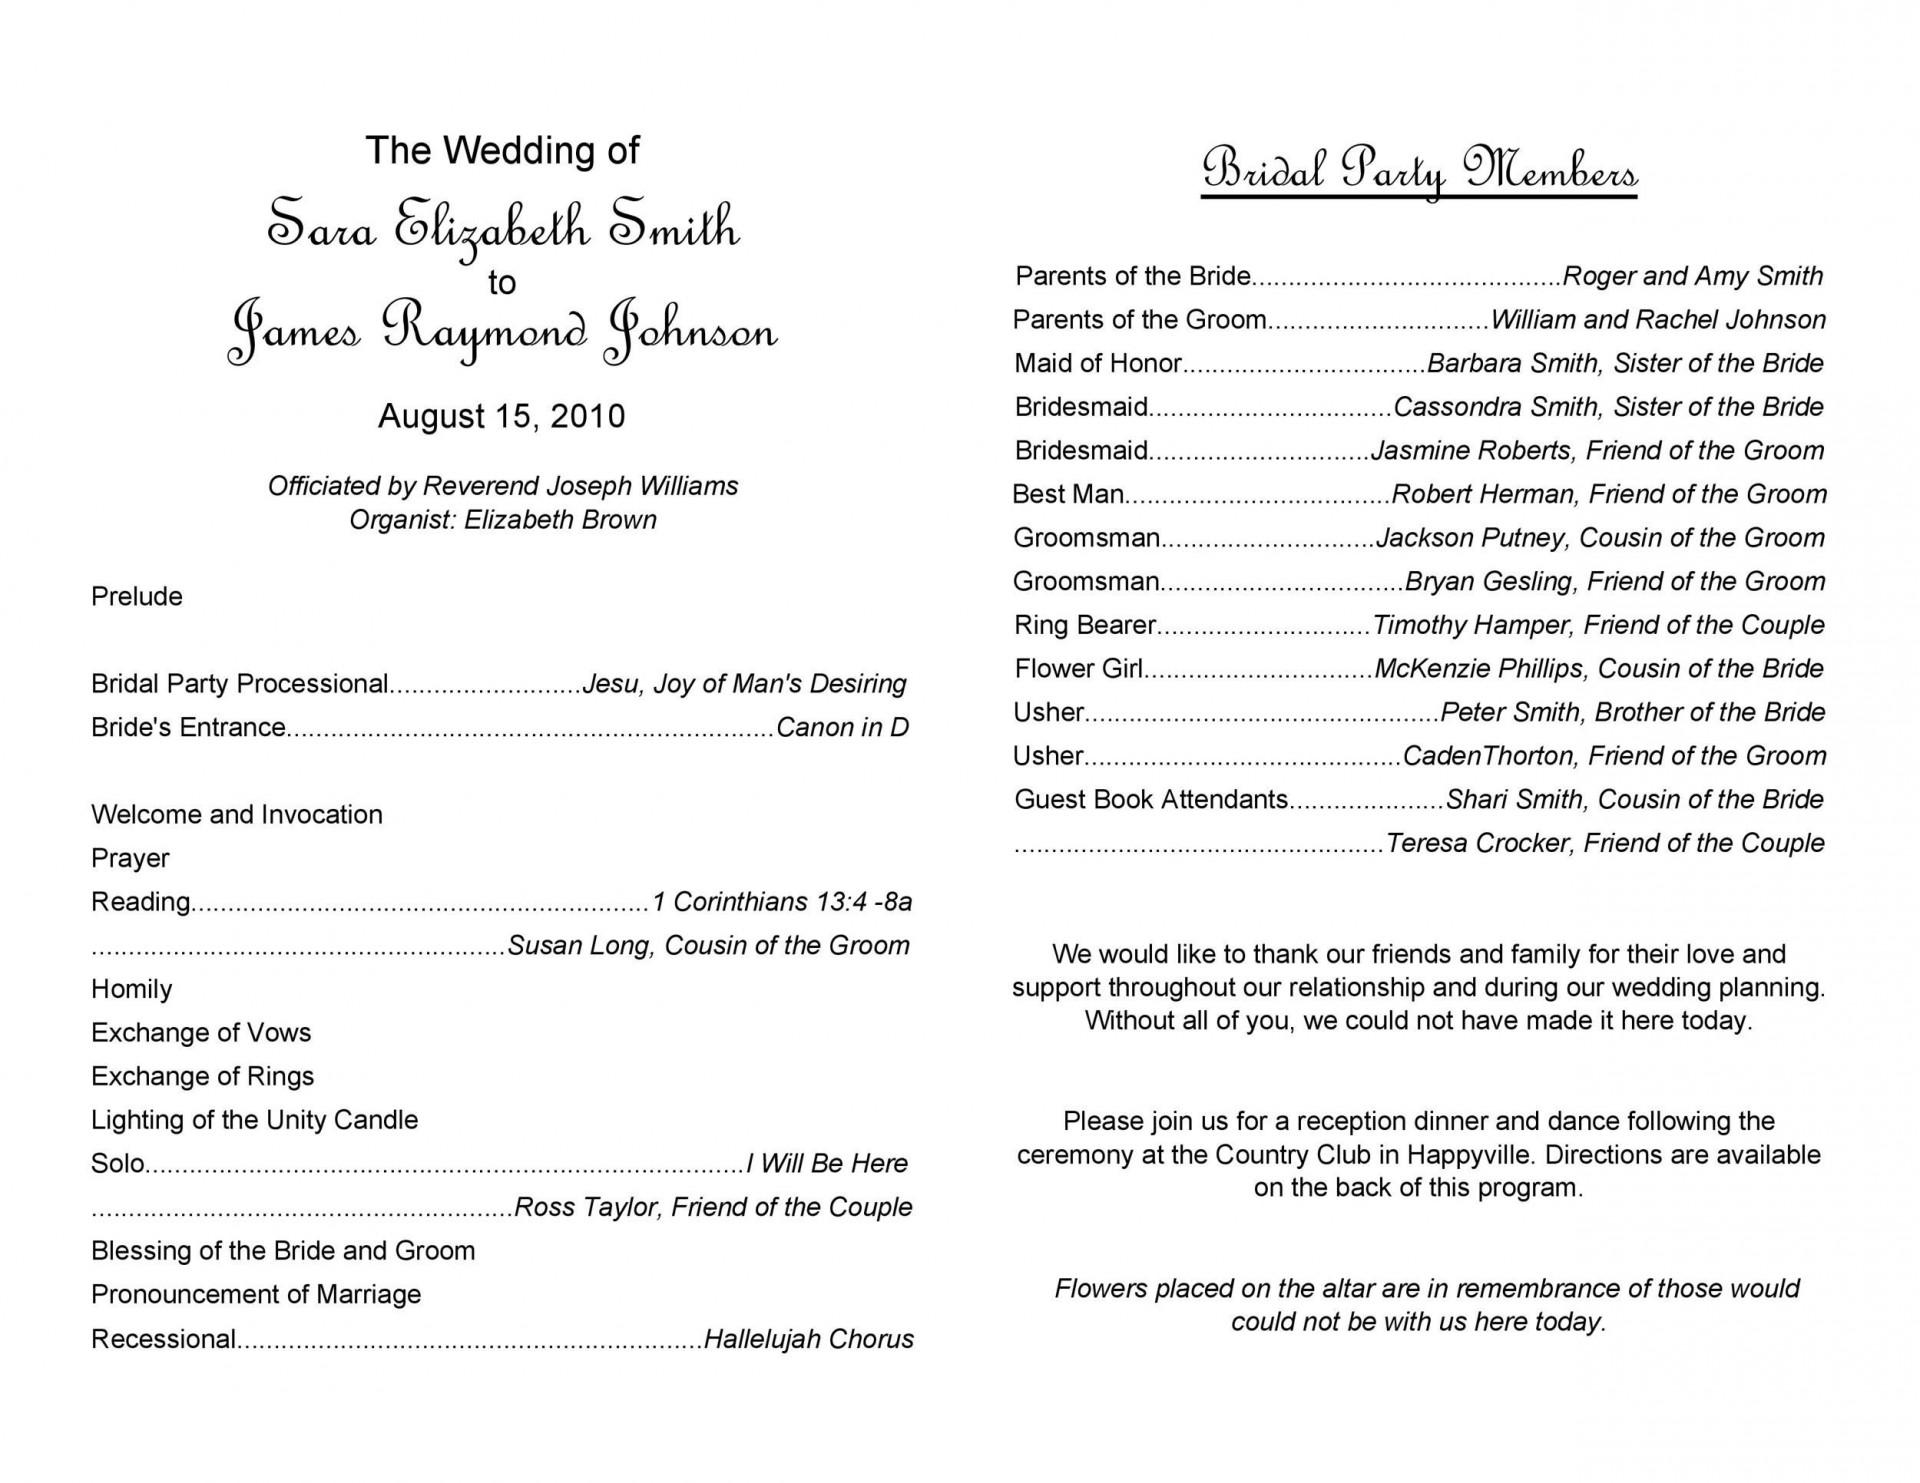 008 Best Free Printable Wedding Program Template High Definition  Templates Microsoft Word Indian1920